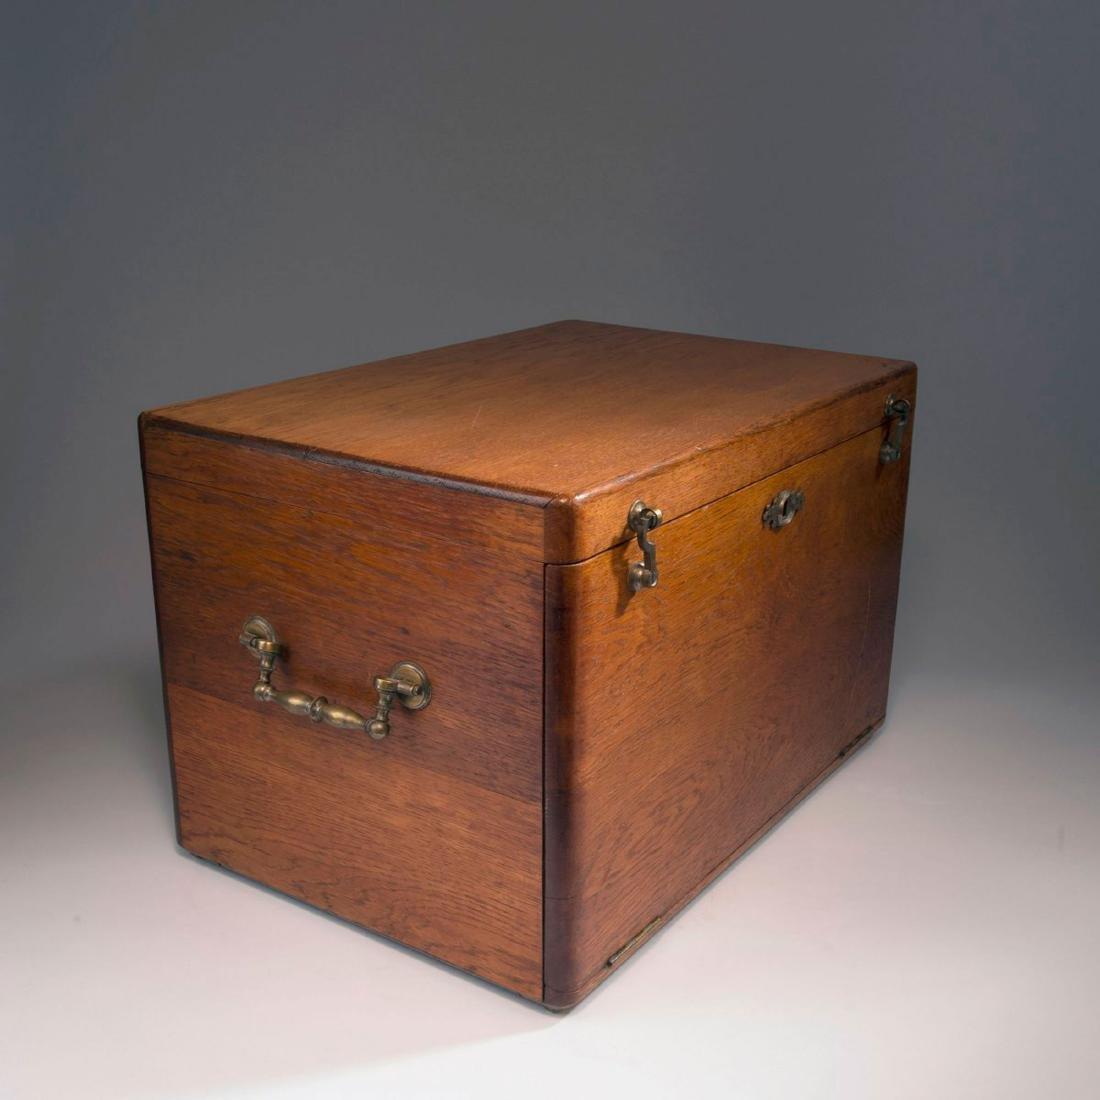 '3001' cutlery in original wooden box, 1901/02 - 7